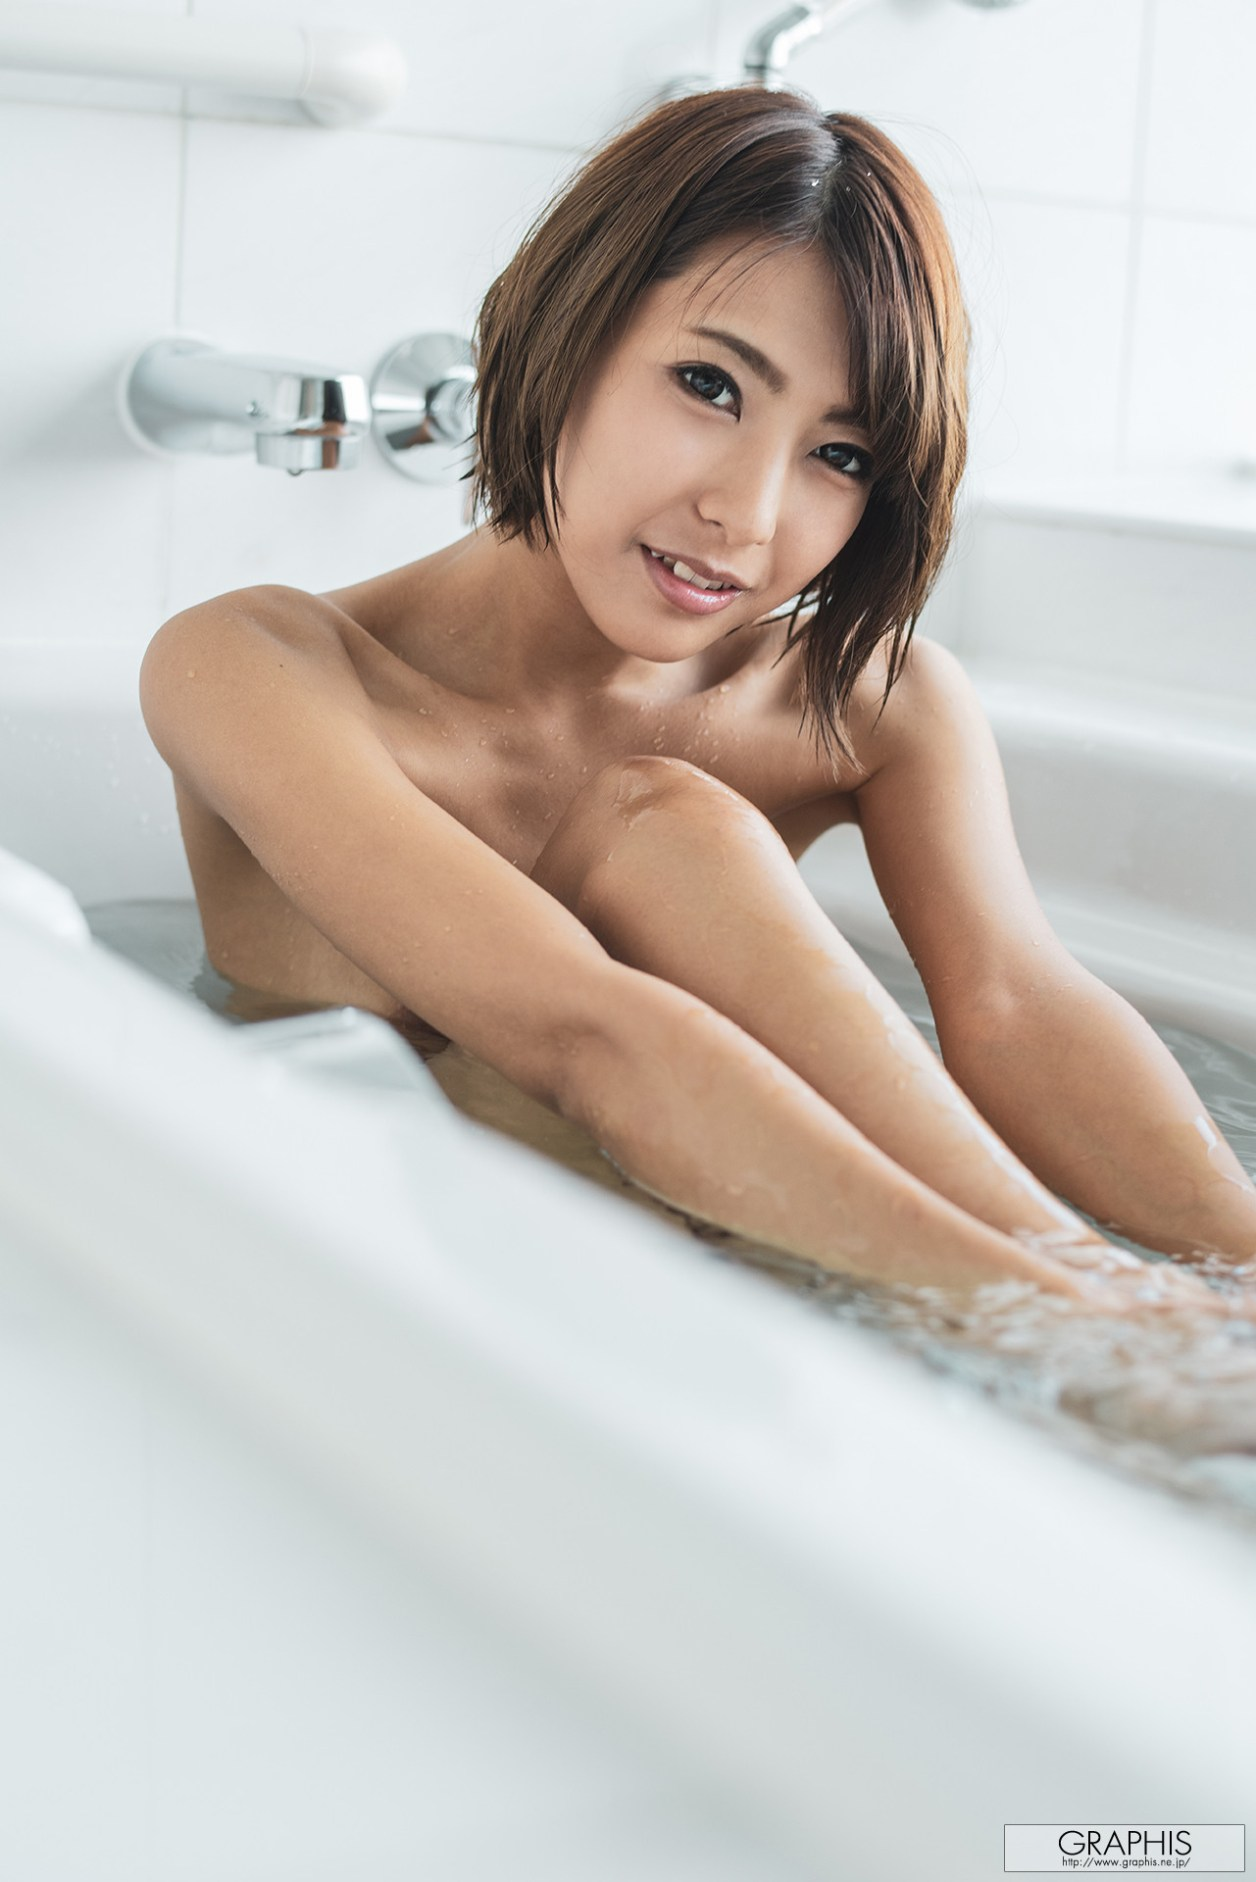 ryo-harusaki-daily026